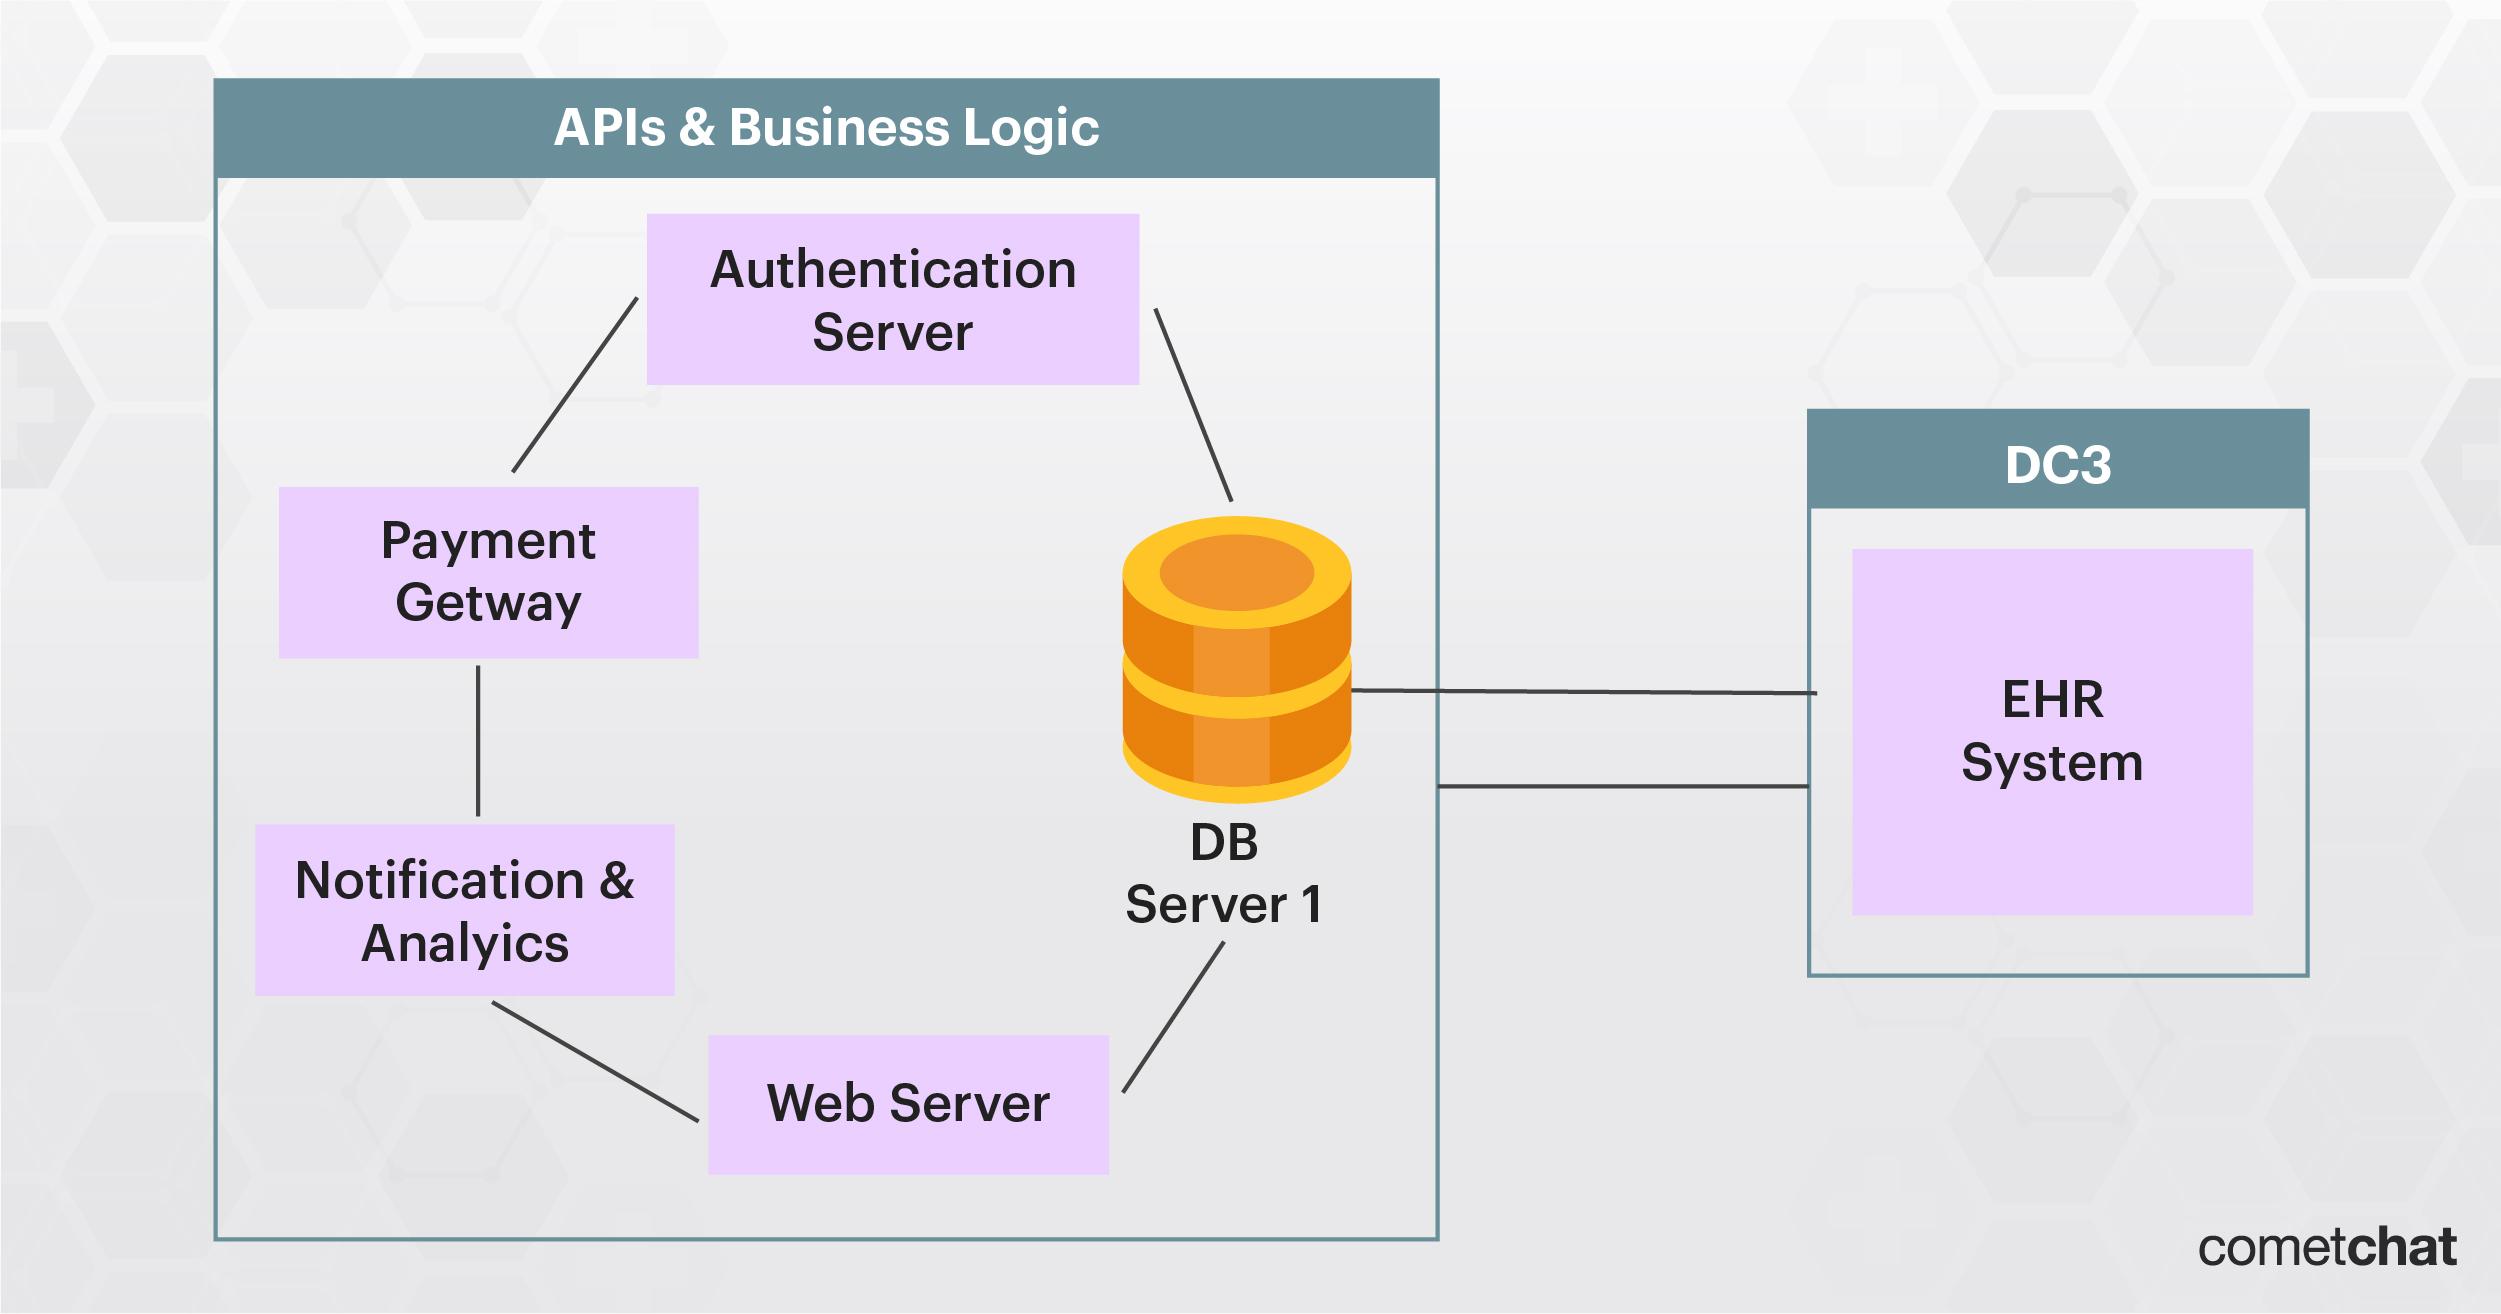 APIs and Business Logic